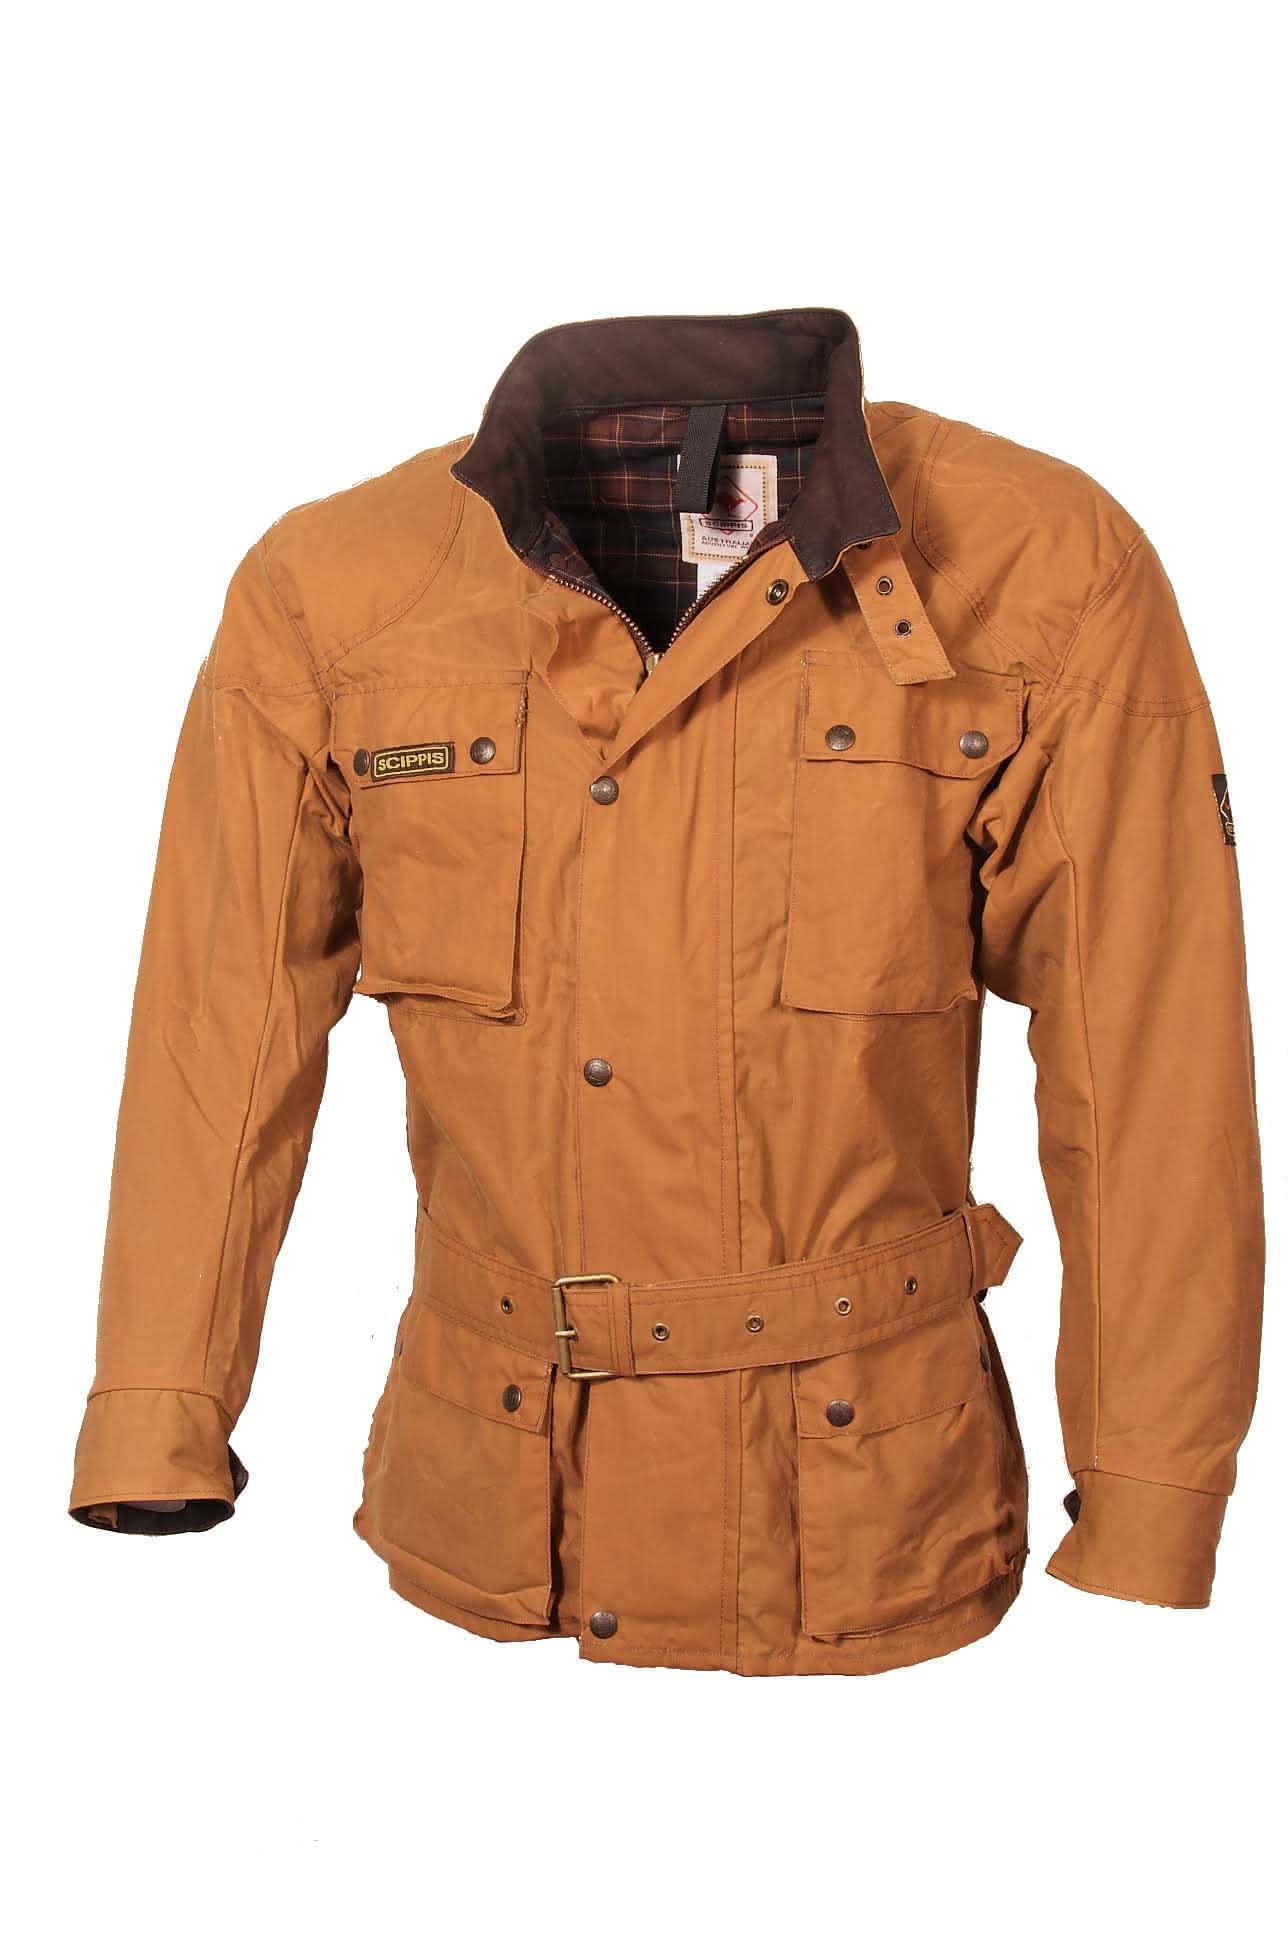 Scippis Belmore Jacket - 2J16 - Tan-XXL